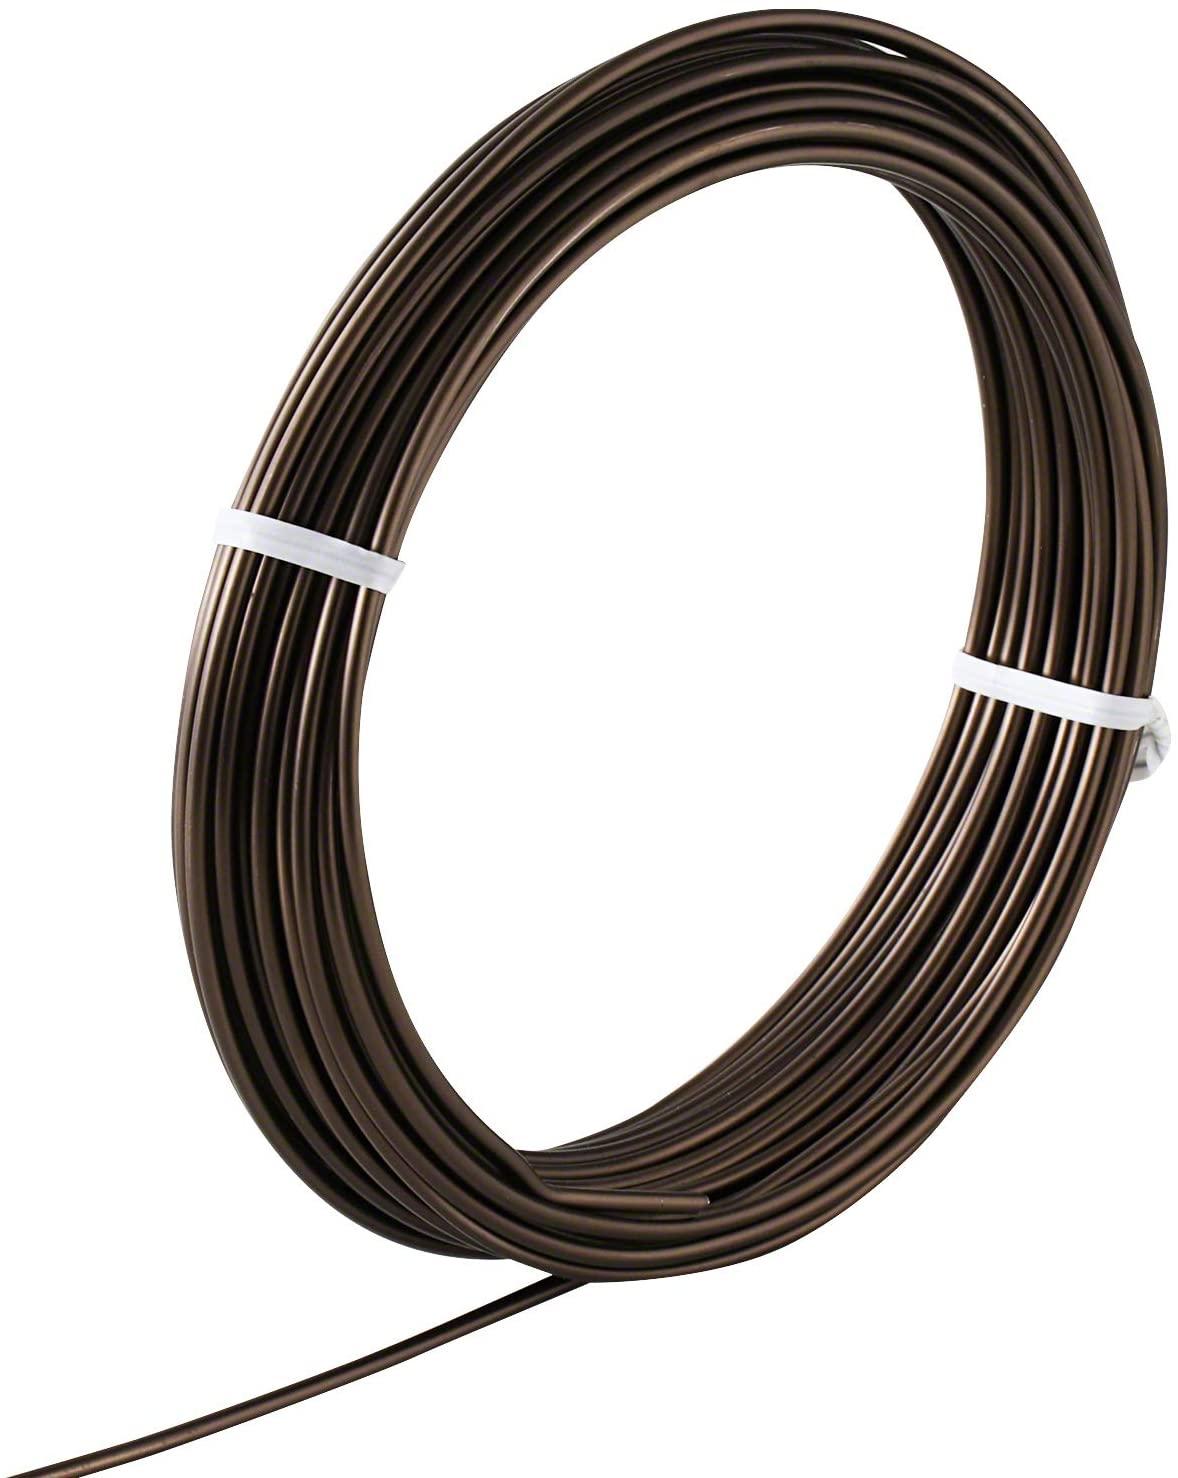 Hanafubuki Wazakura Japanese Bonsai Training Wire 6.0mm, Brown Anodized Coating Aluminum Made in Japan 150g - 3.93Ft(1.2m) 6.0mm